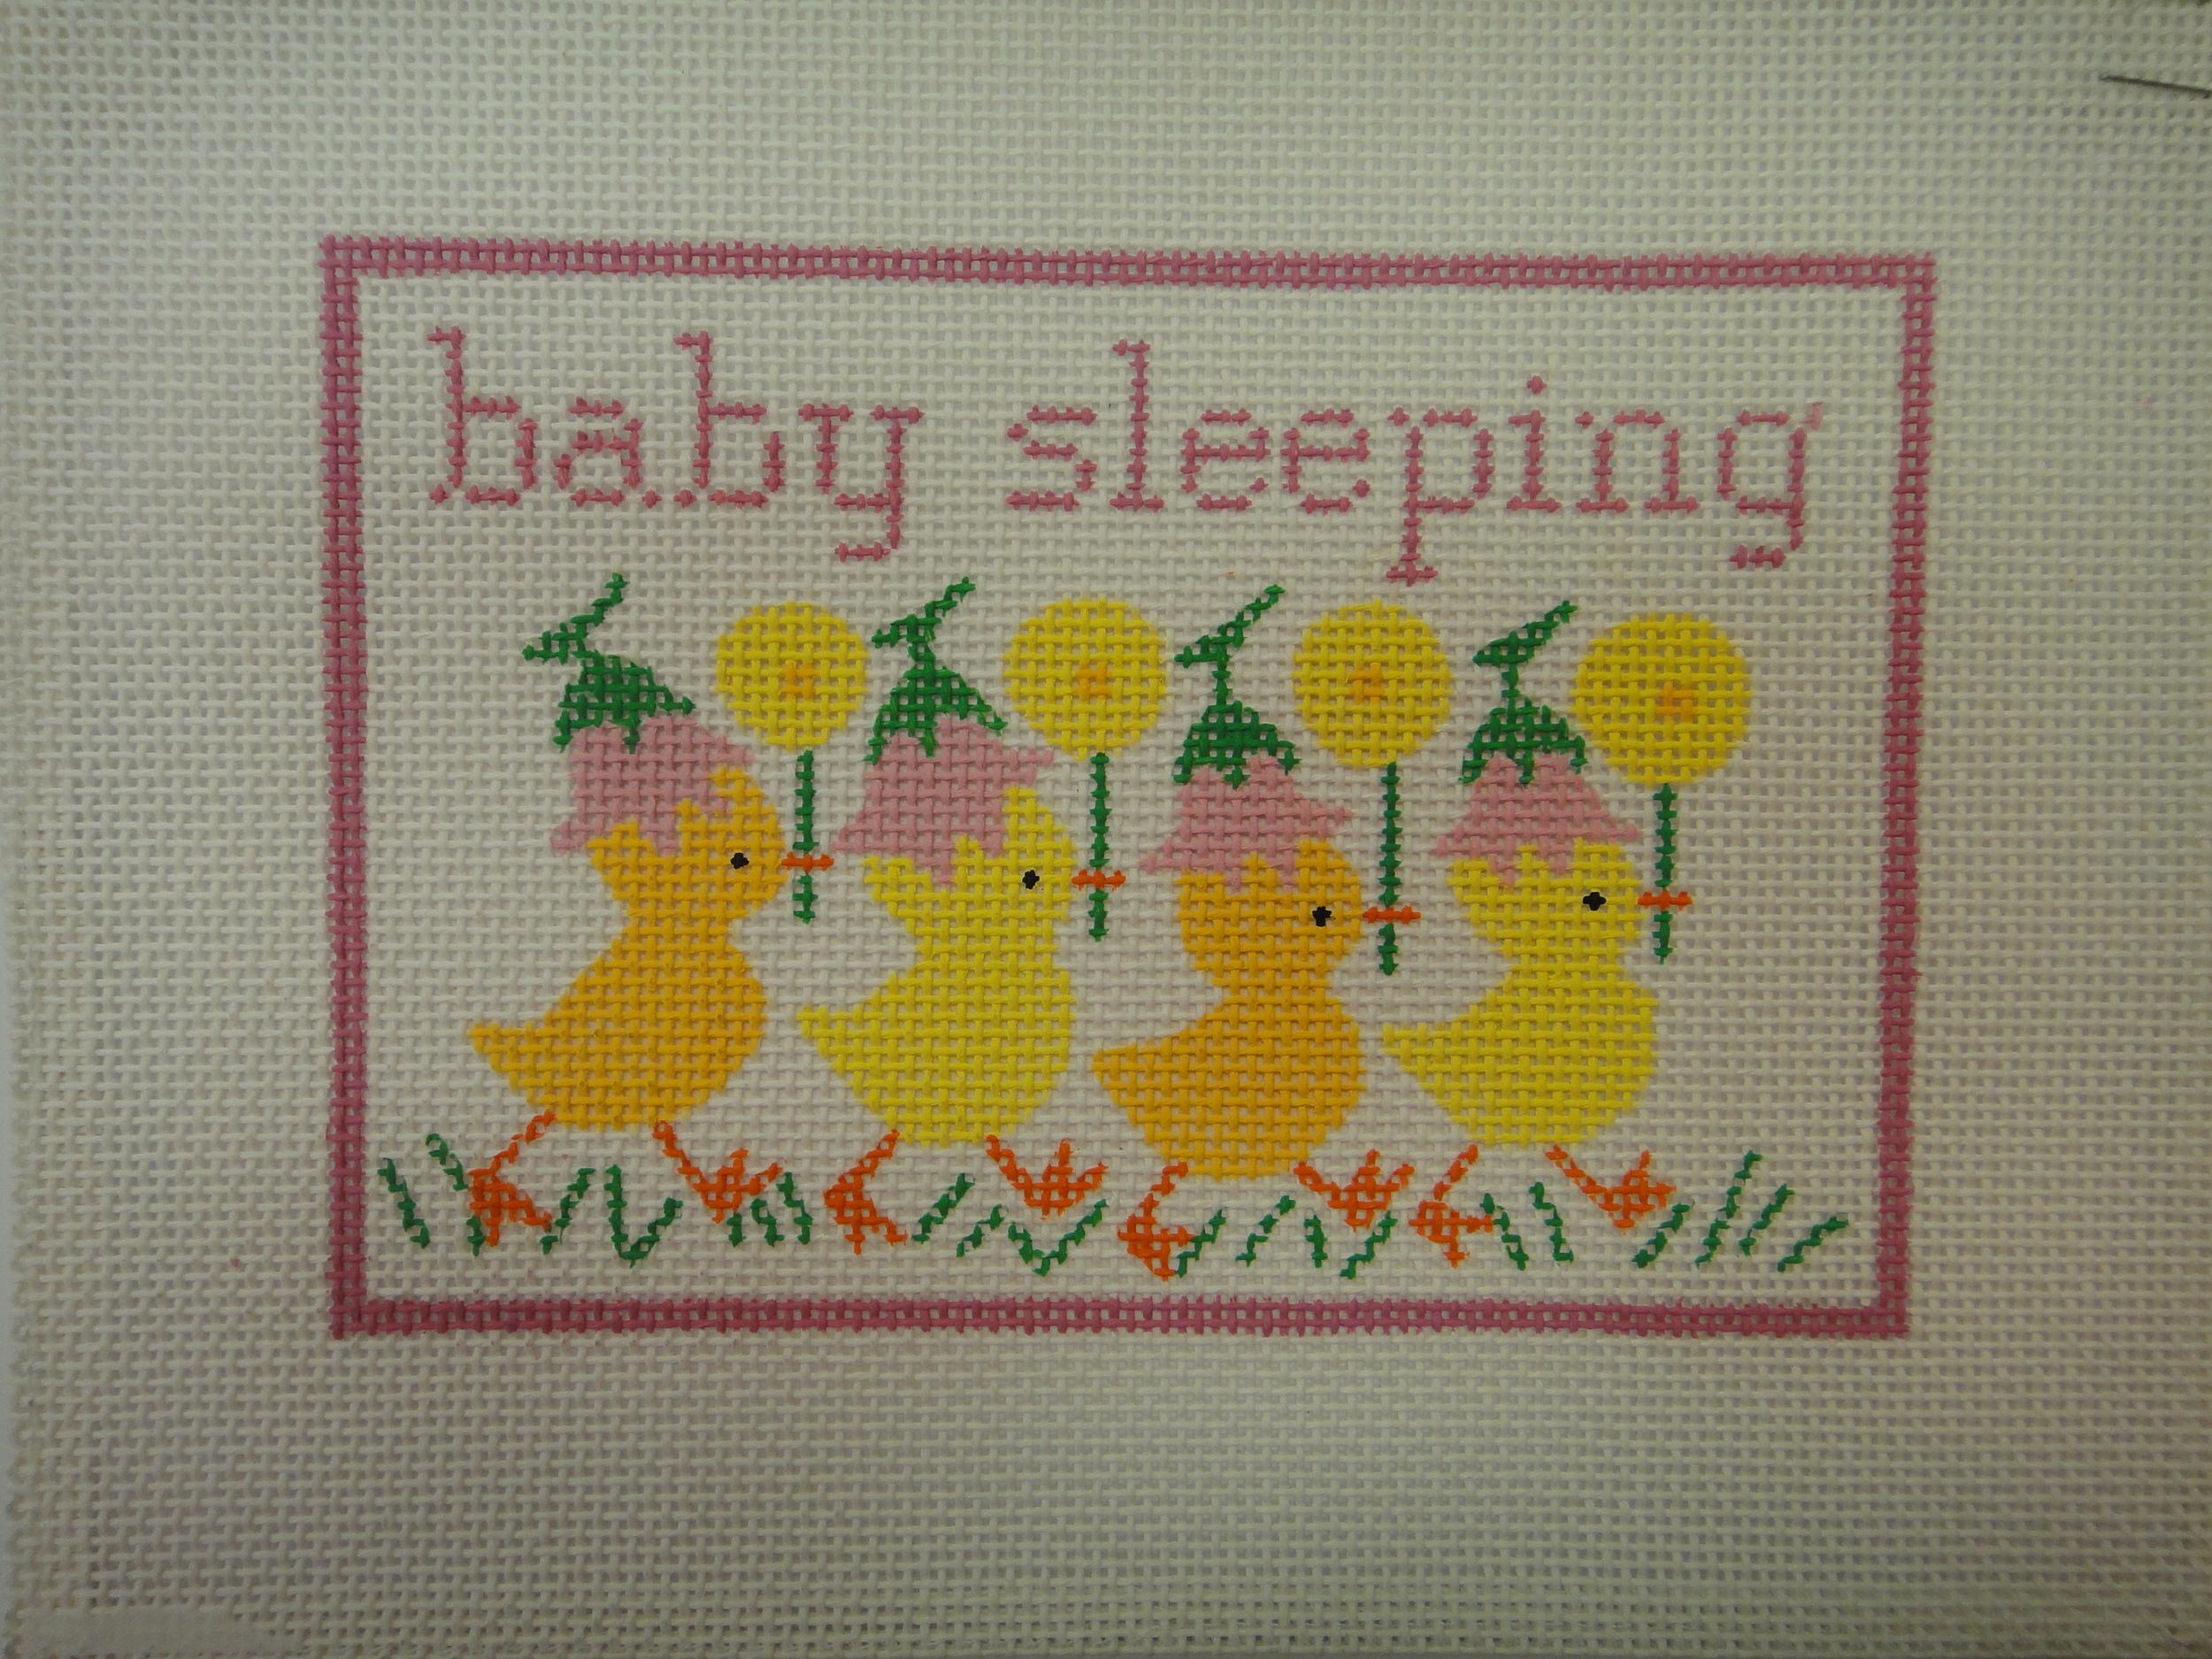 S21B Baby Sleeping with Ducks, Pink (7x5)